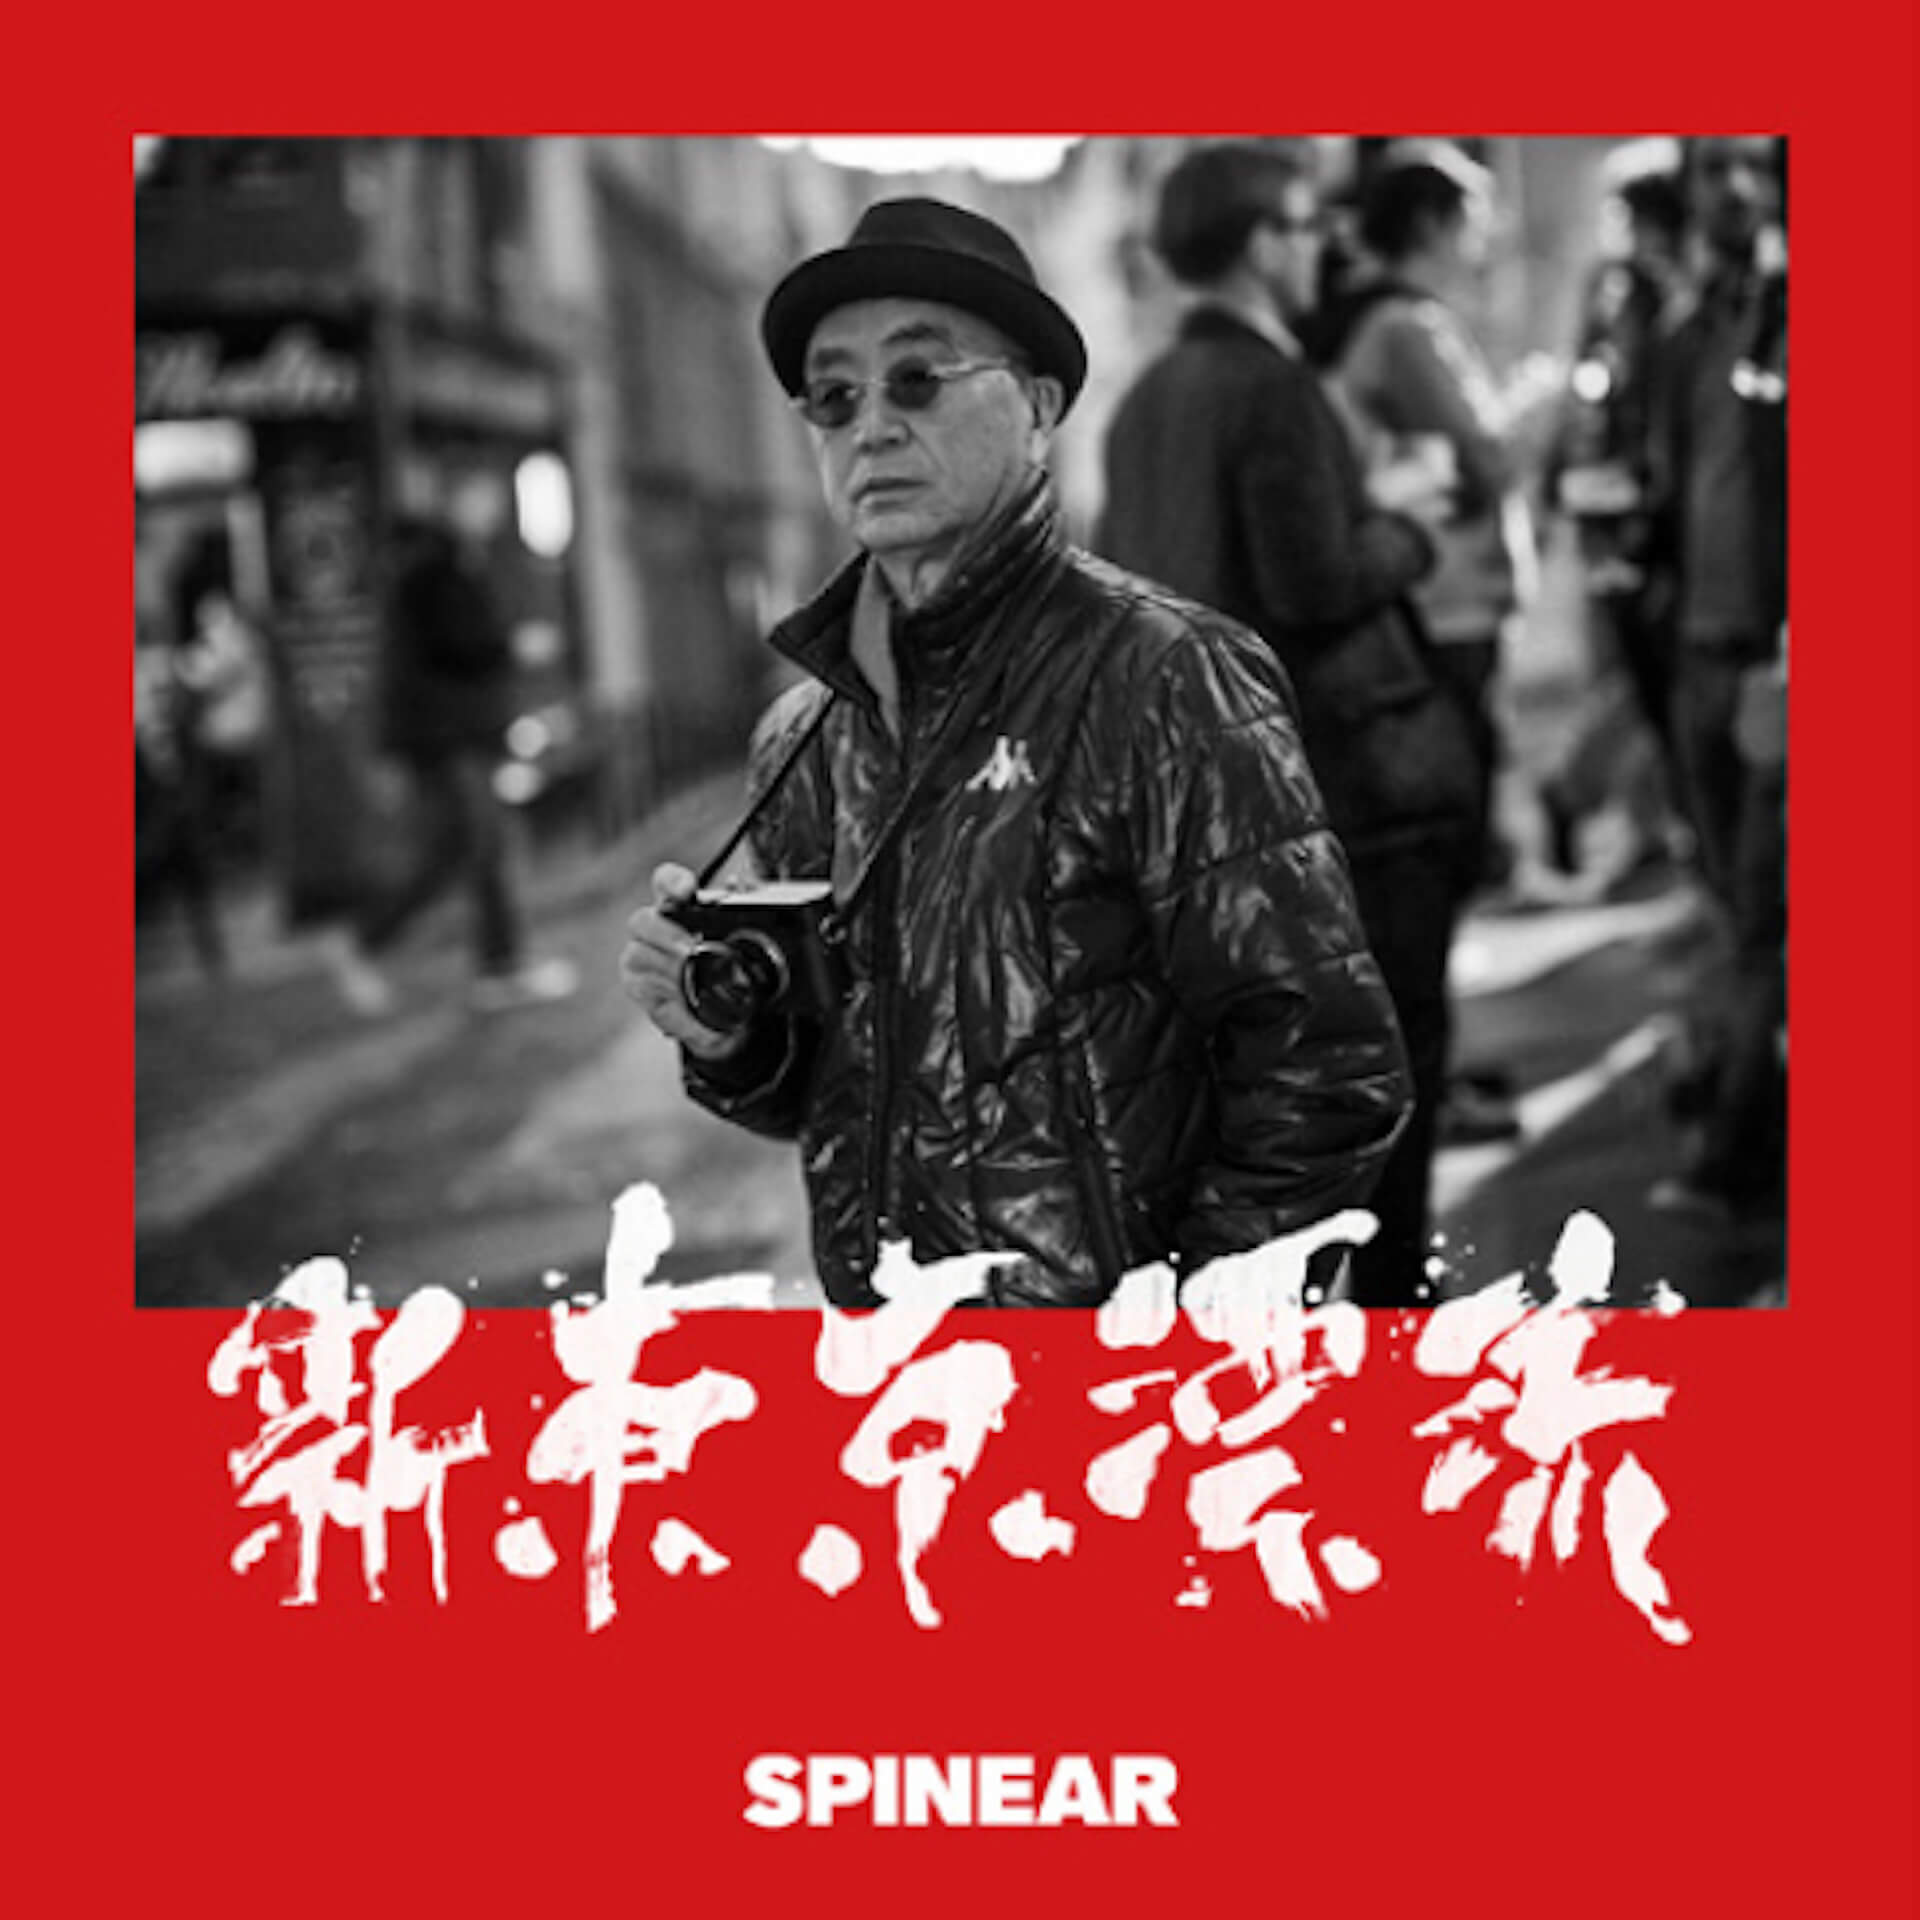 JAVEによるデジタル音声コンテンツ配信サービス「SPINEAR」β版がスタート!アジカン・後藤正文やのんが出演するオリジナルコンテンツも ac200408_spinear_05